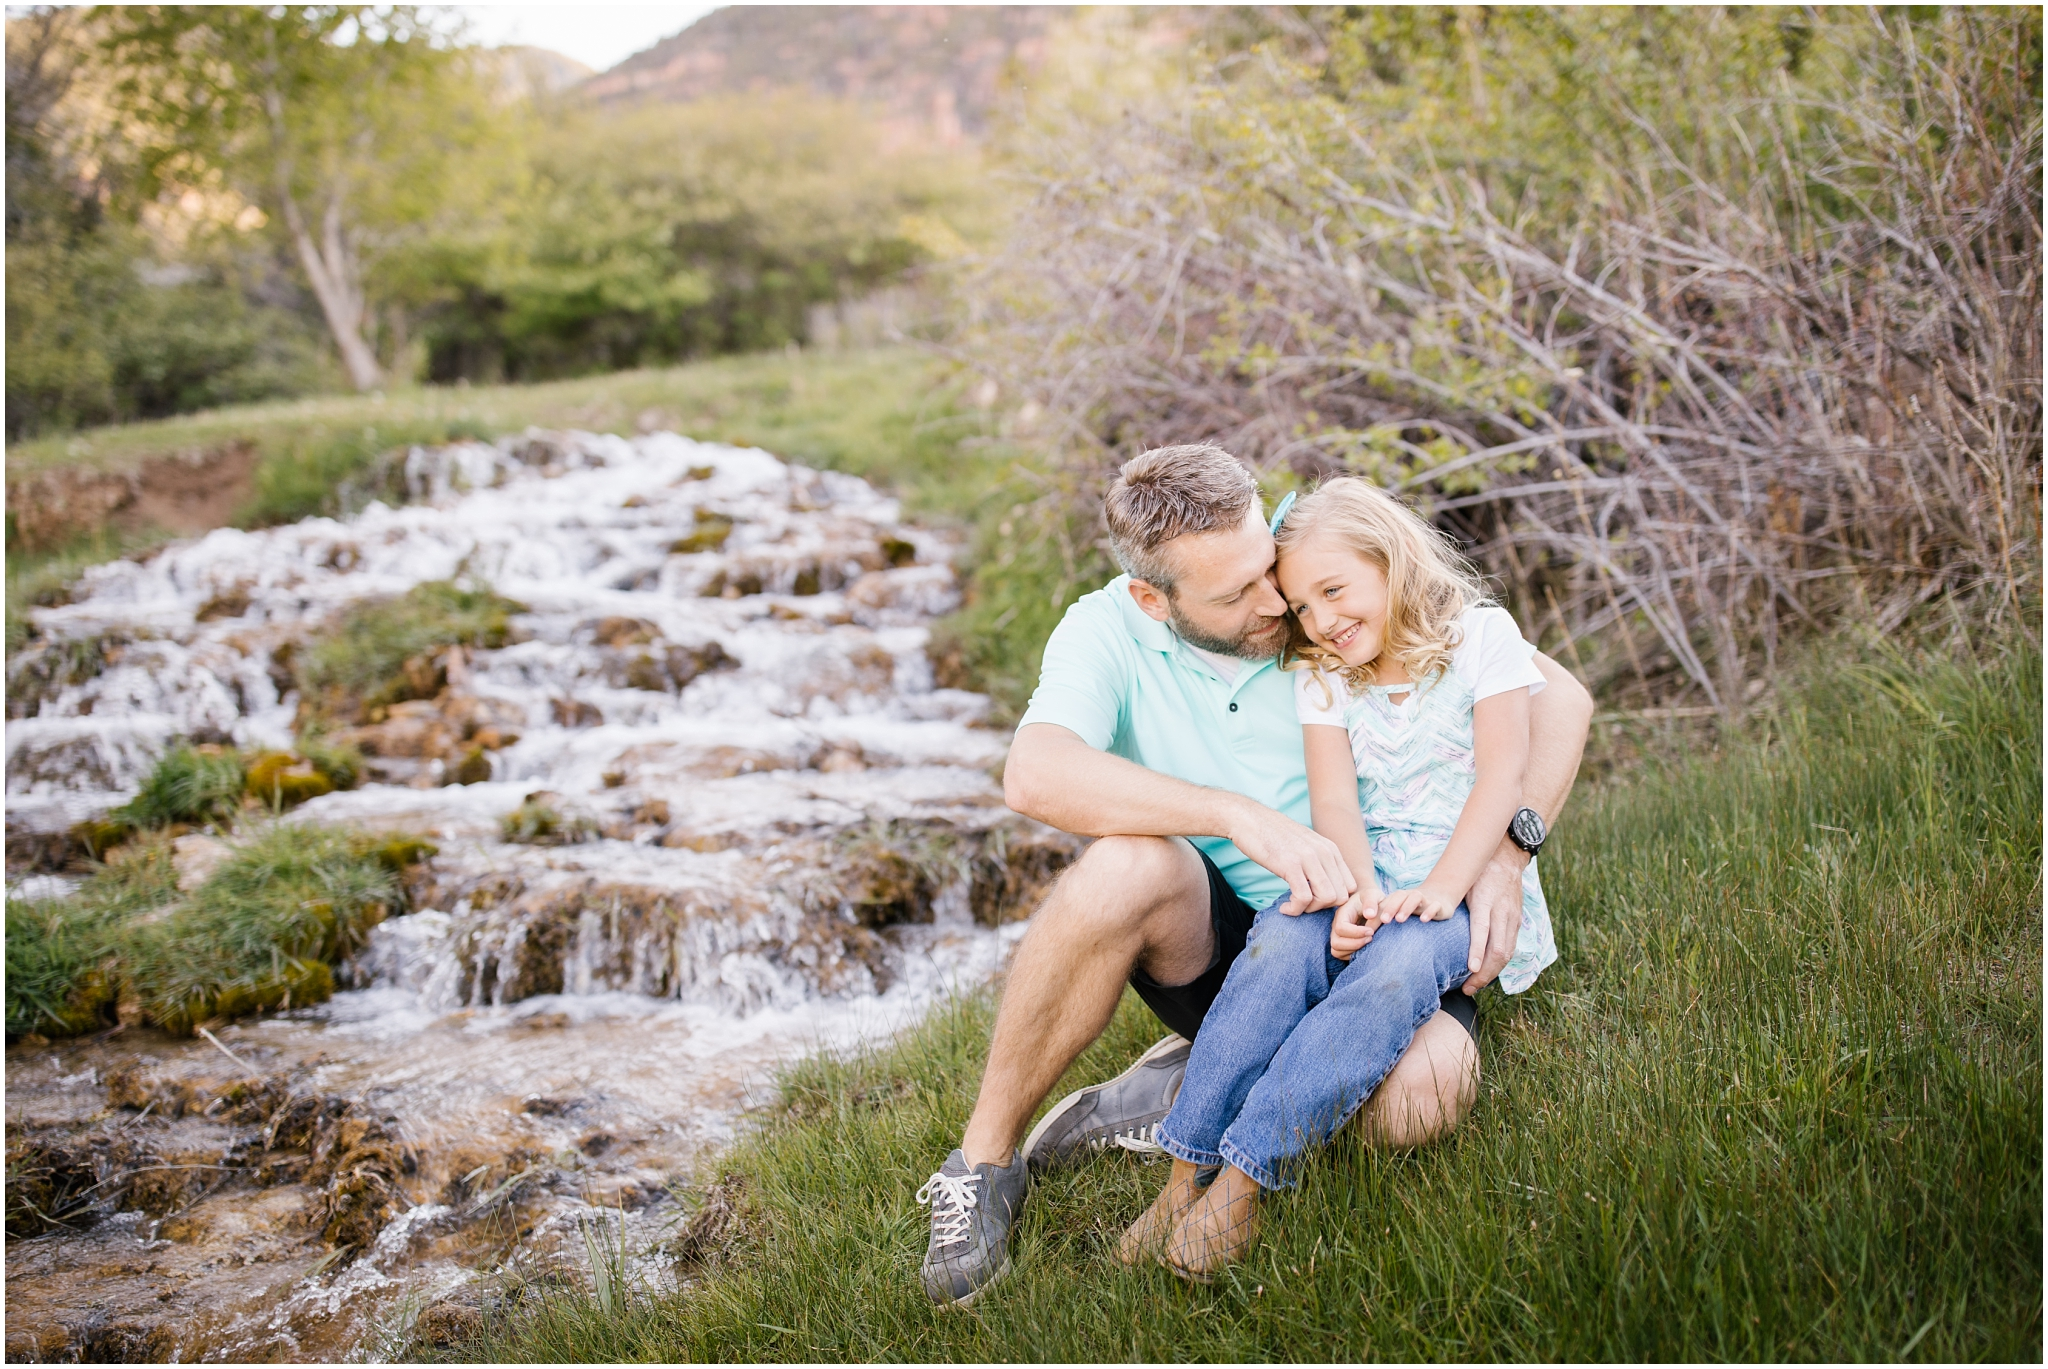 Bagley-83_Lizzie-B-Imagery-Utah-Family-Photographer-Central-Utah-Photographer-Utah-County-Extended-Family.jpg